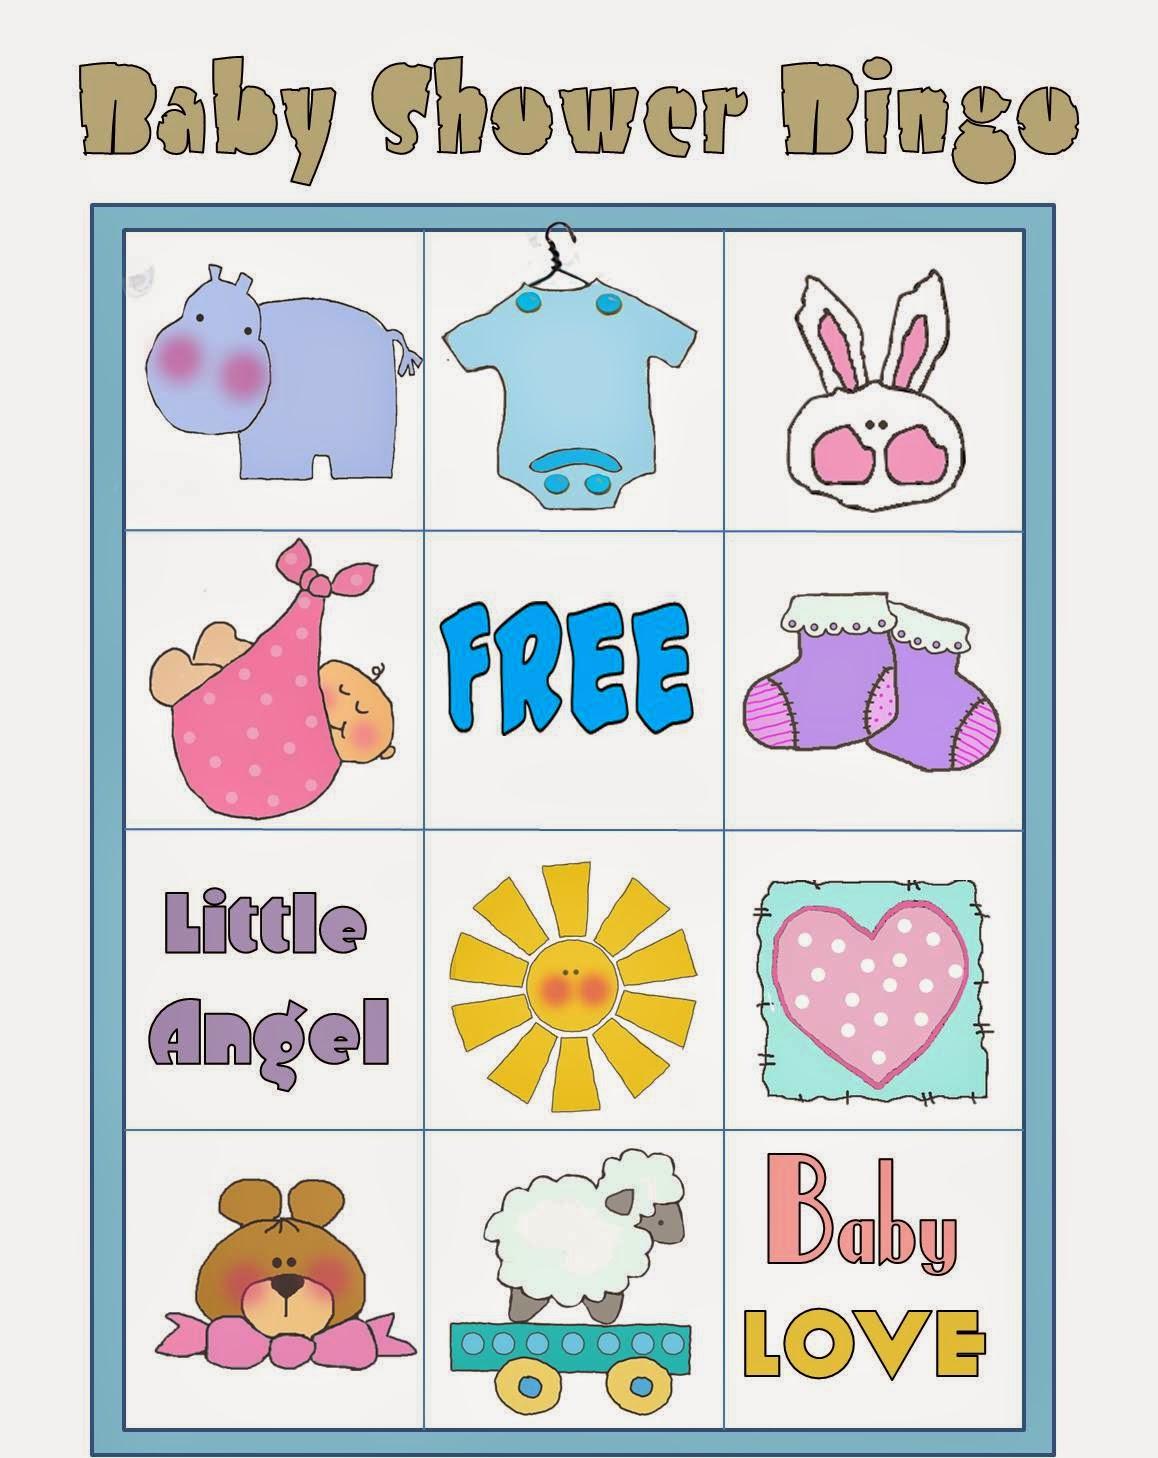 Free Printable Baby Shower Bingo In Colors